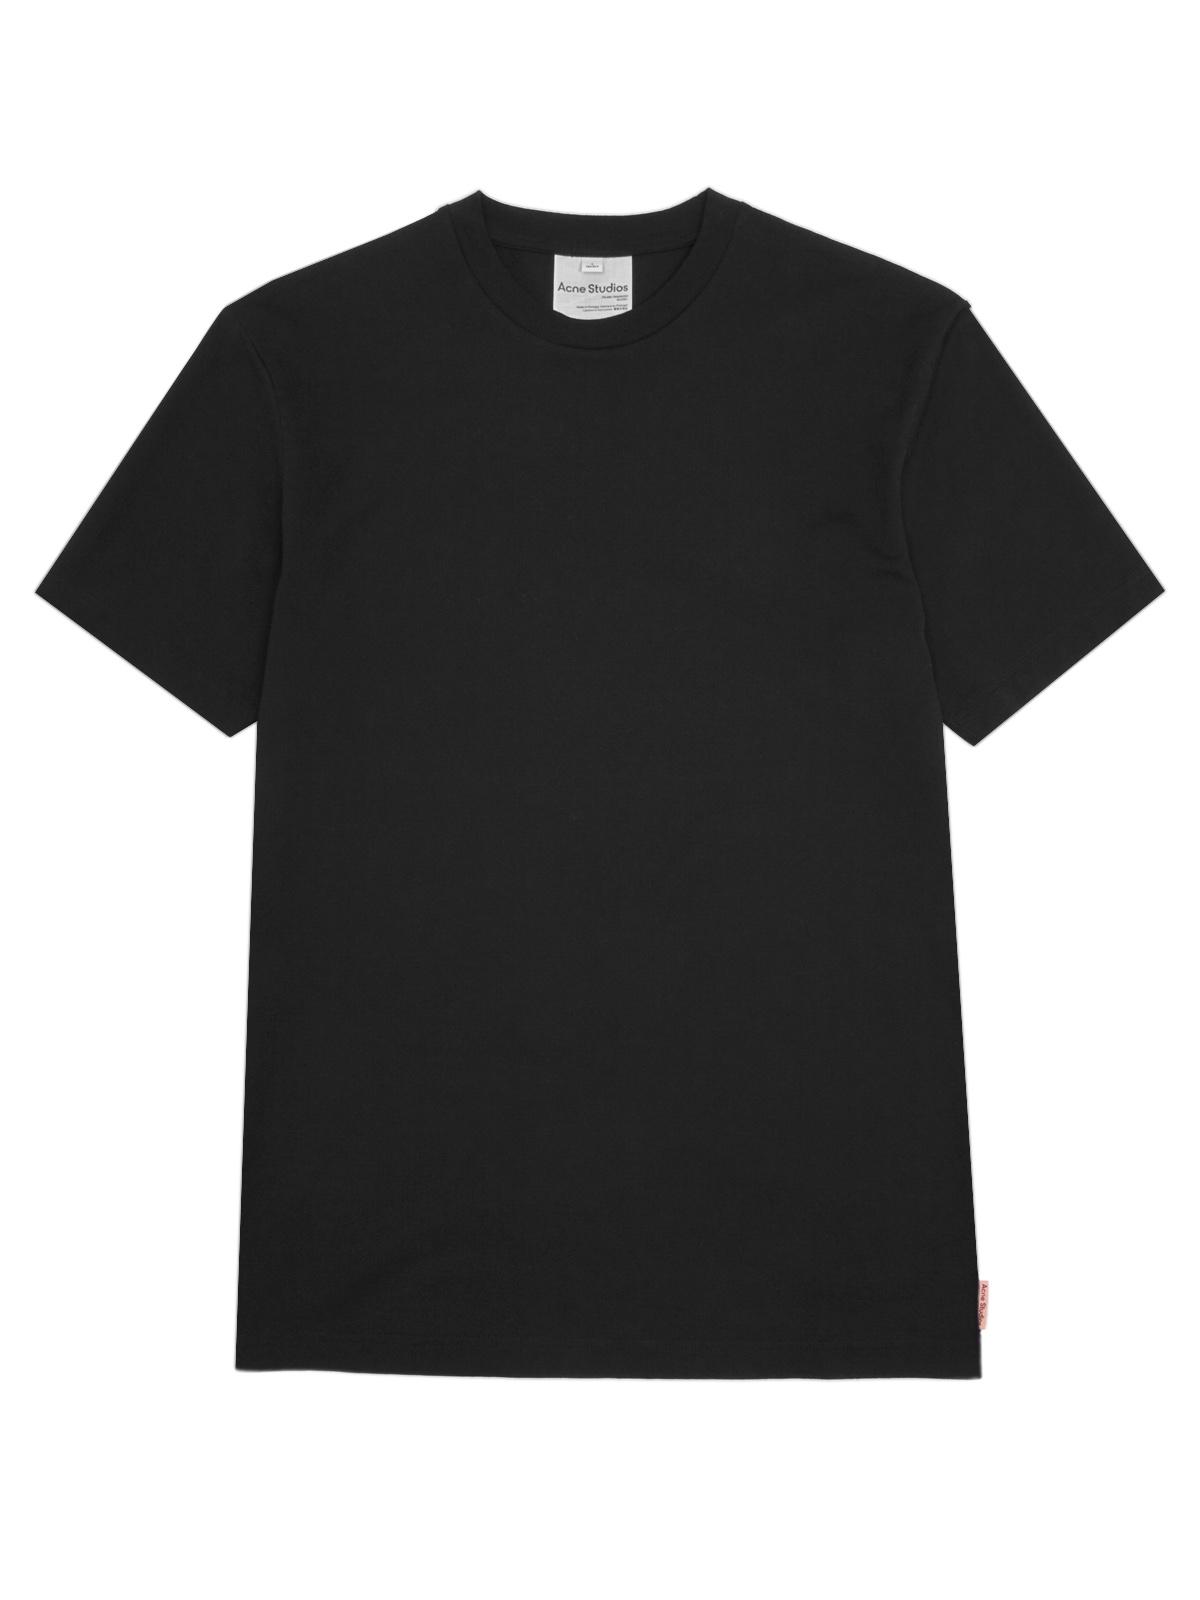 T shirt everrick pink label black